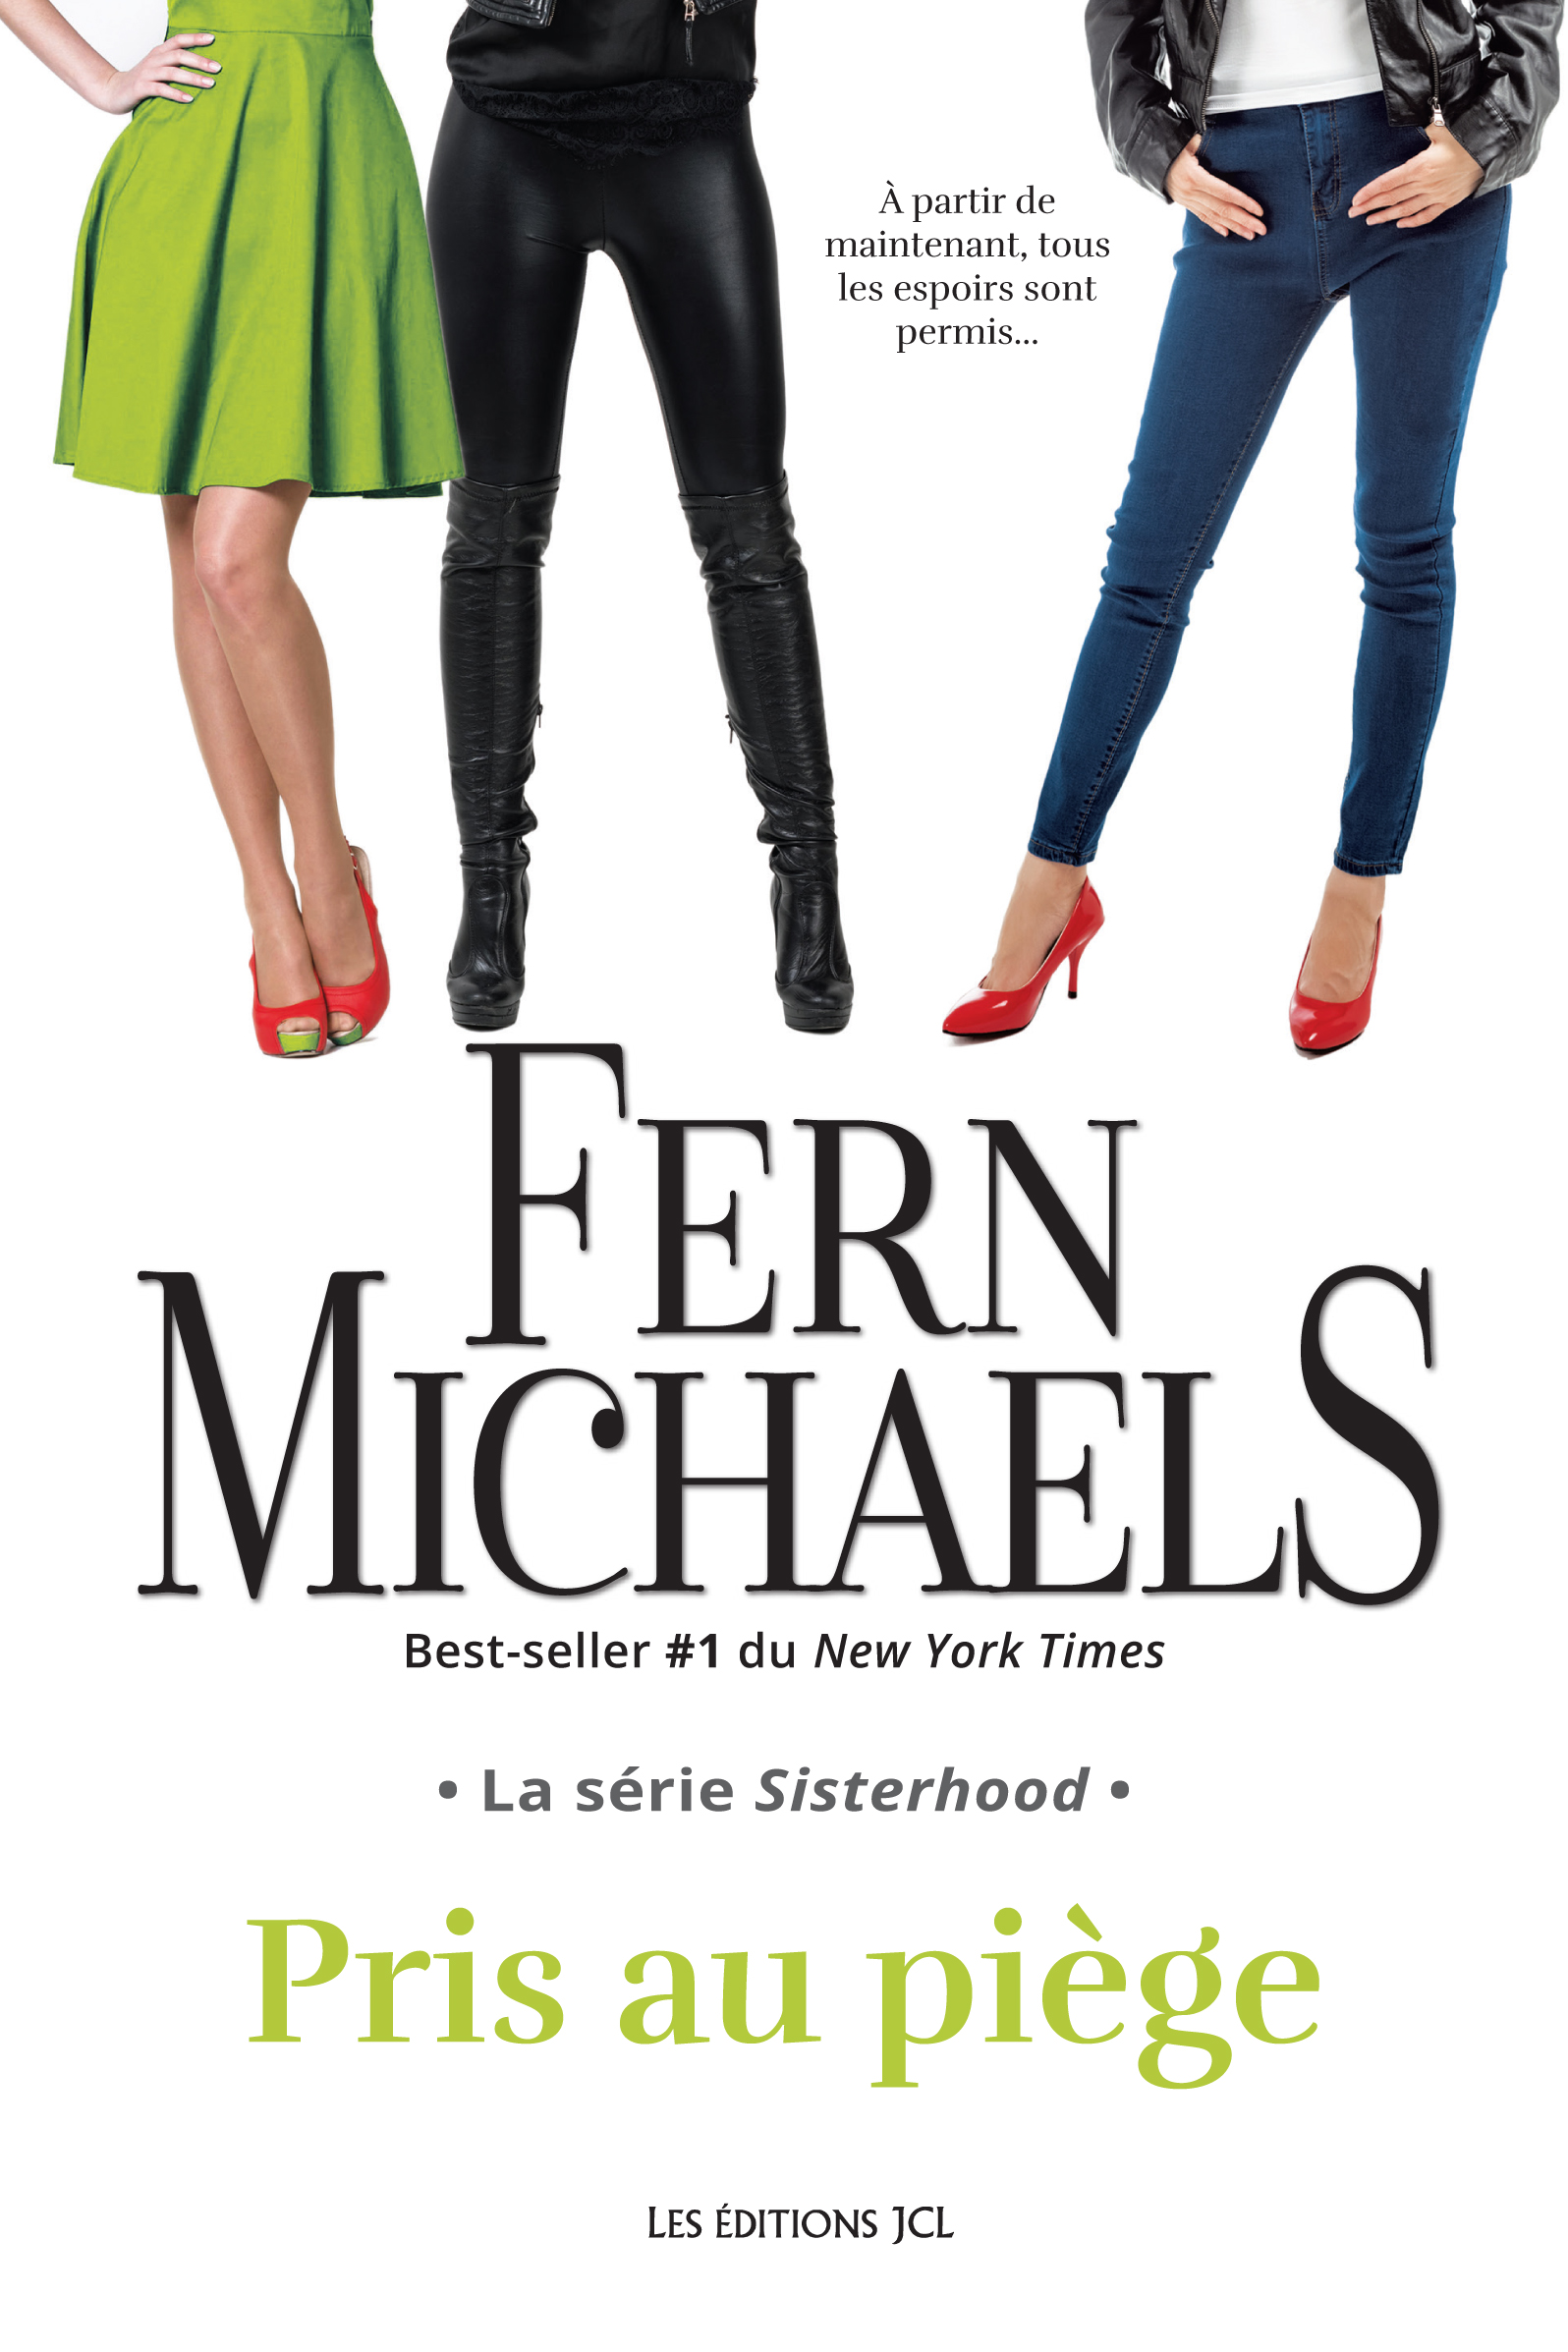 La série Sisterhood, Pris a...